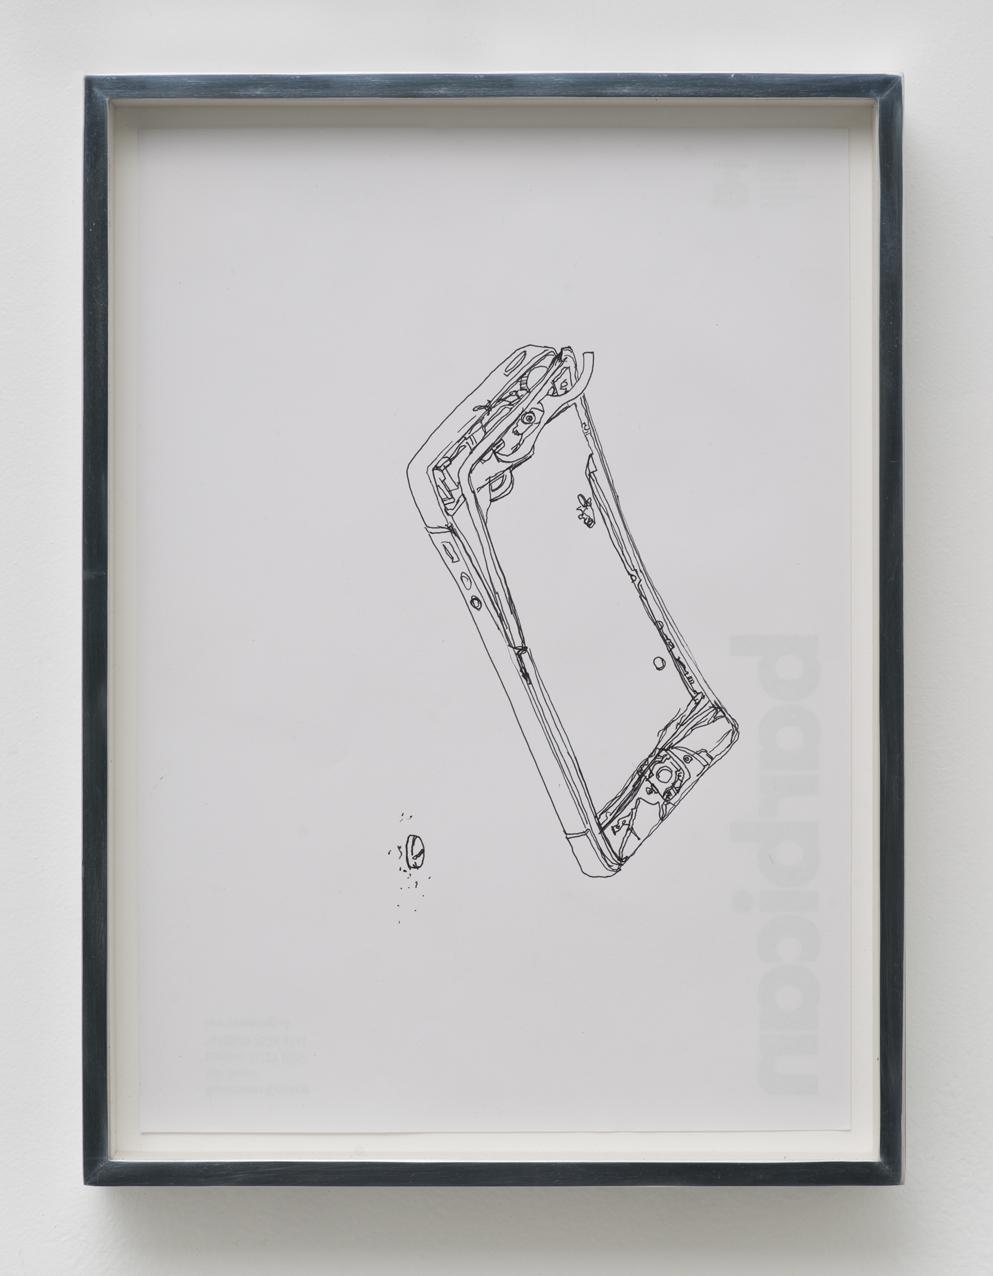 iPhone 5 A1429/Adderall, Amphetamine and Dextroamphetamine 10 mg, cor 132, Round, Multi-Segmented, Core Pharmaceuticals, Inc.: Barbican Centre, London, United Kingdom, October 10, 2014   2015  Ink on letterhead  12 7/8 x 9 1/2 inches   Drawings, 2014–    Walid AlBeshti, 2015    Atopolis, 2015